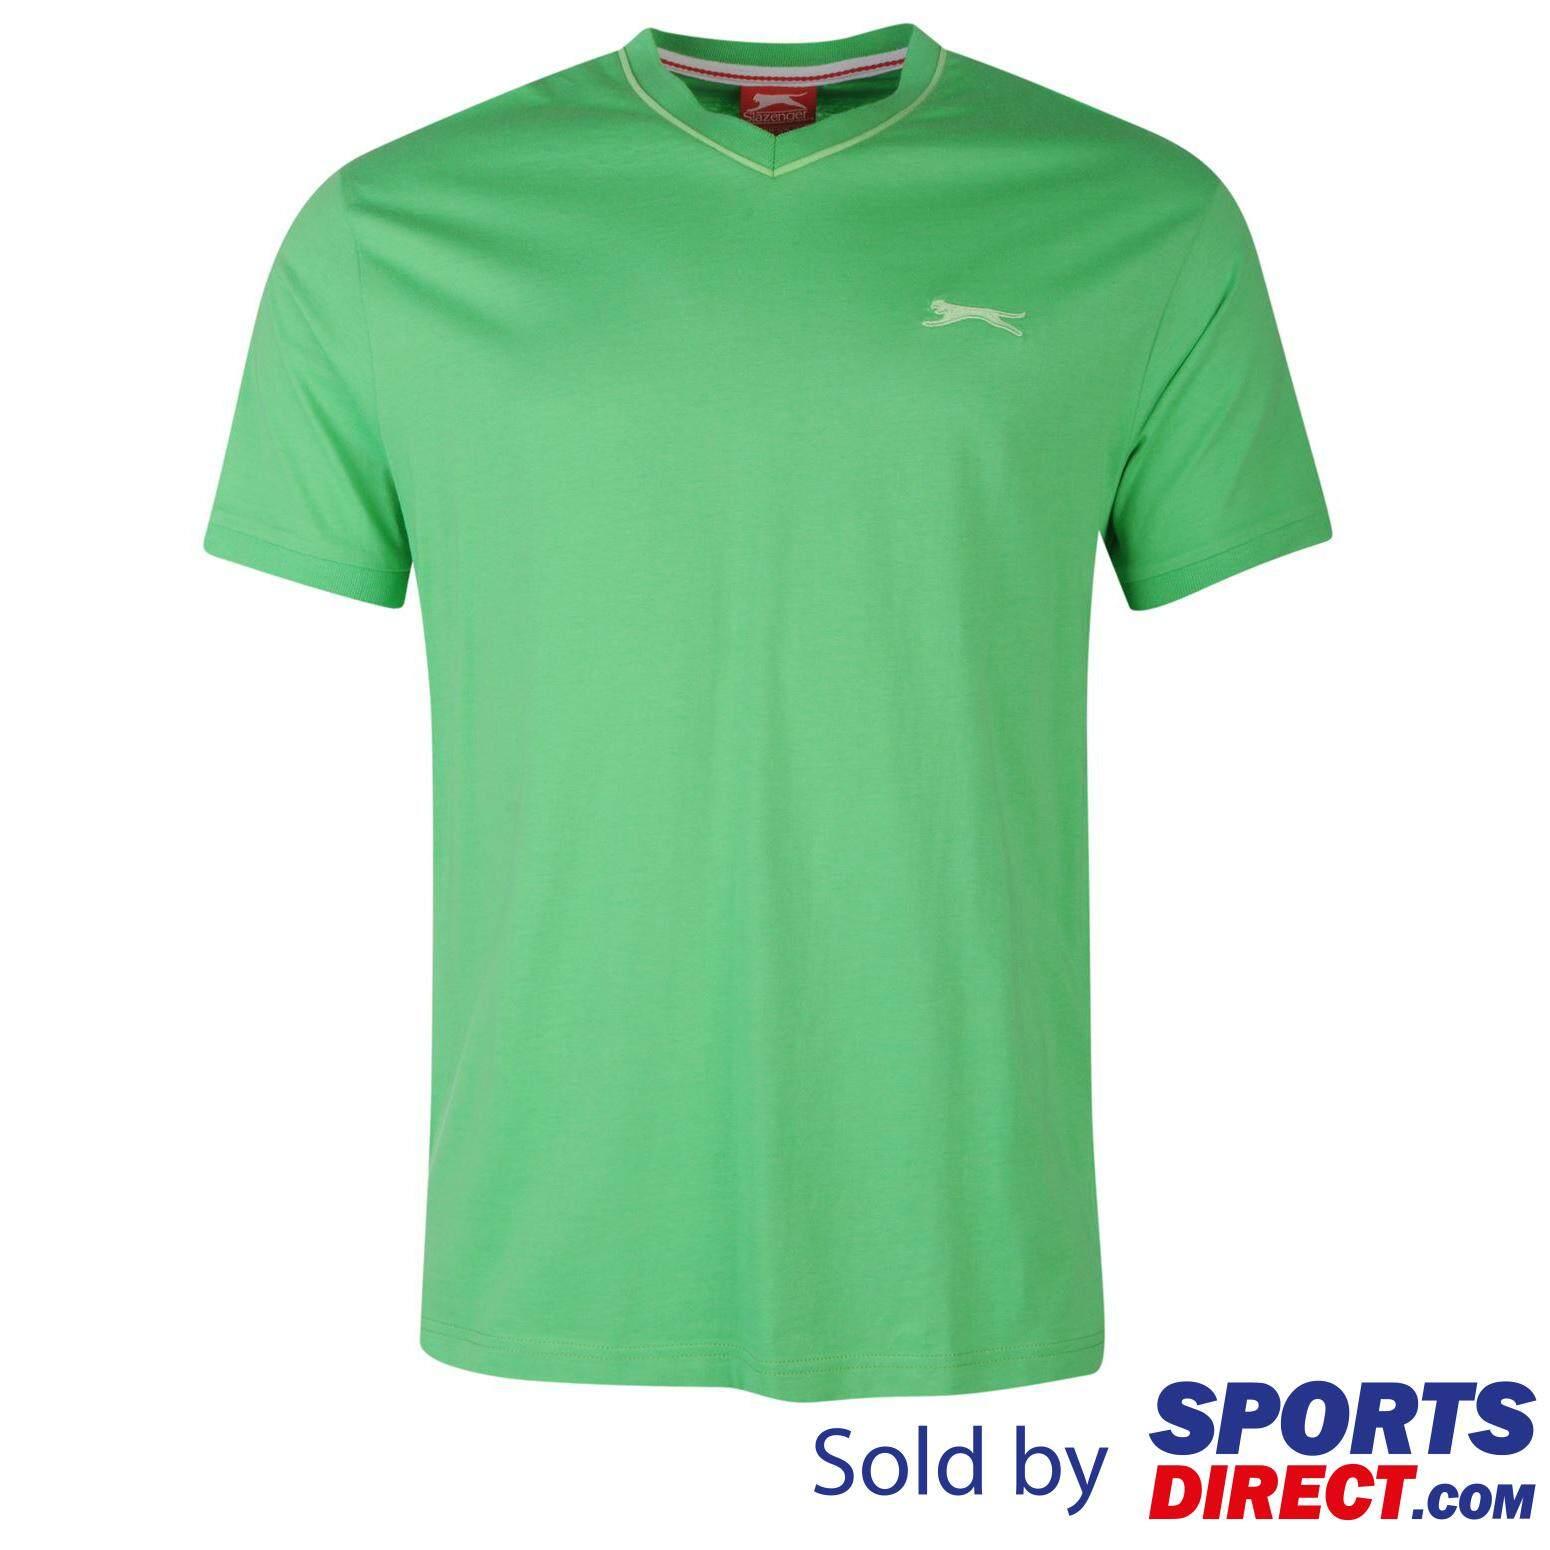 c439bb1155 Terminus,Slazenger Men's T-Shirts & Tops price in Malaysia - Best ...